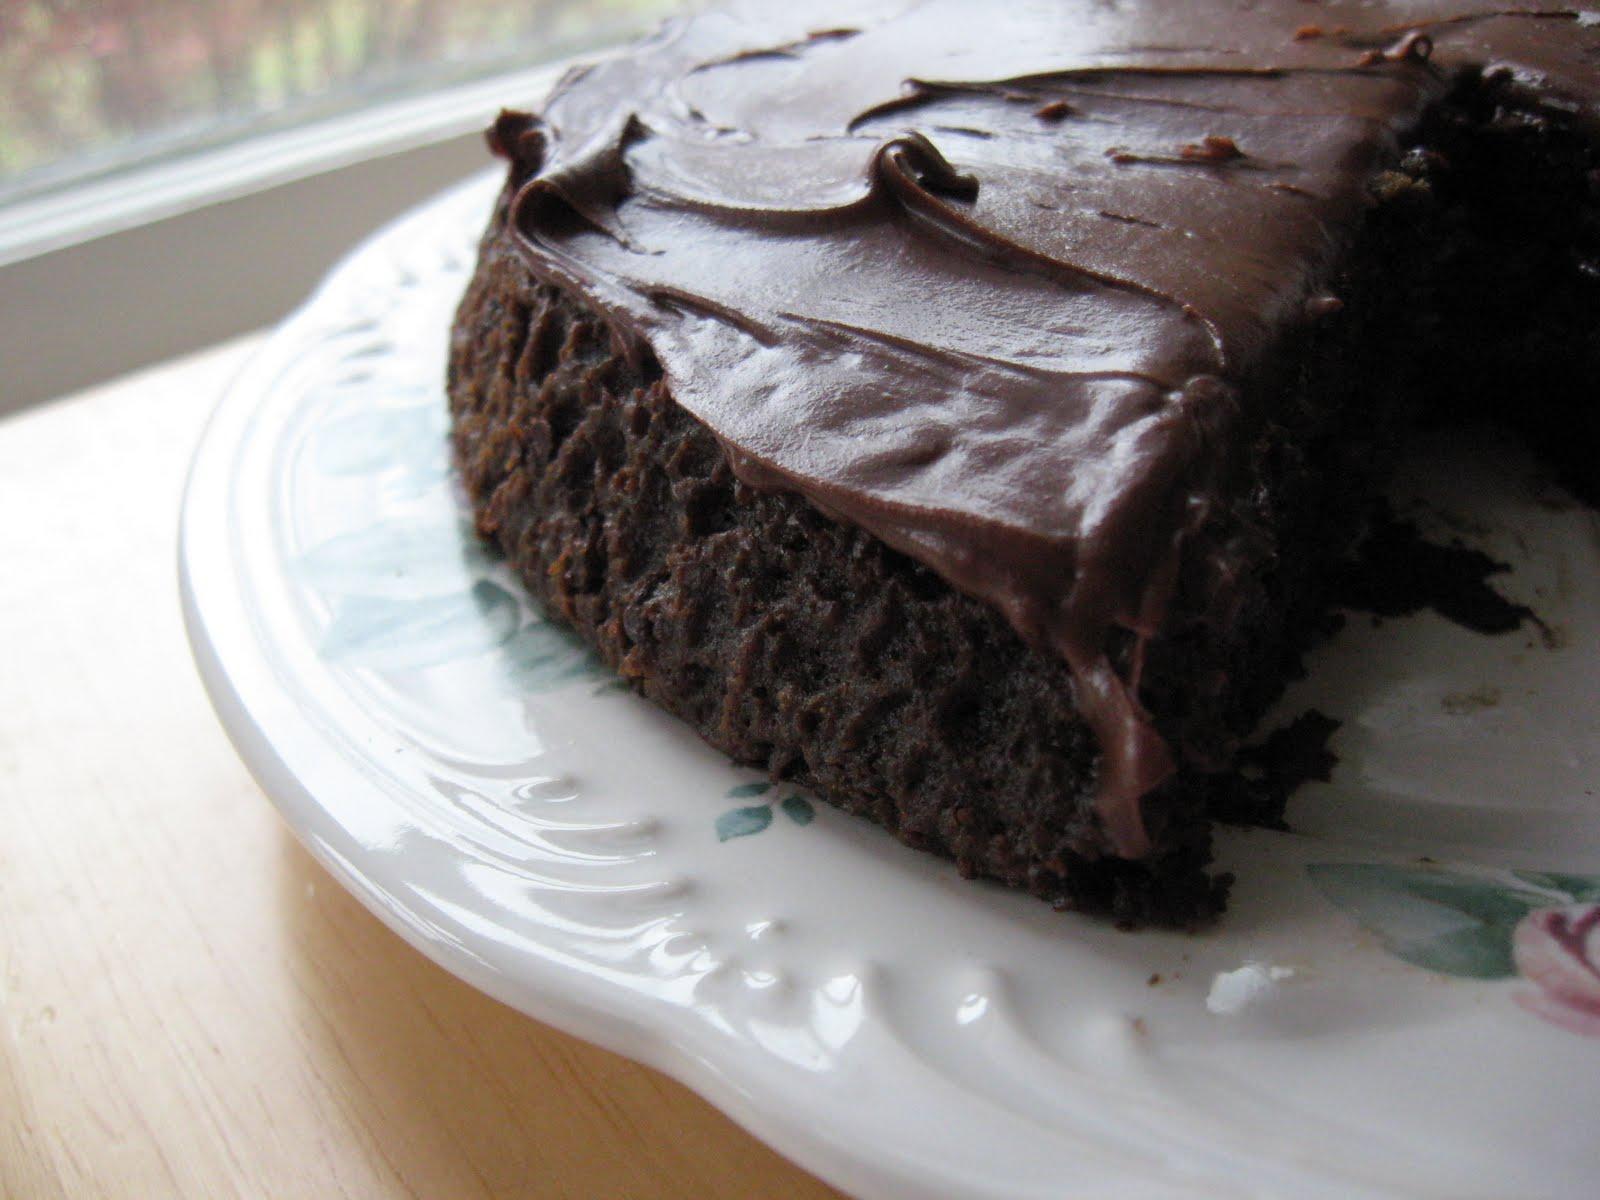 Carrie S Forbes Gingerlemongirlcom Gluten Free Vegan Chocolate